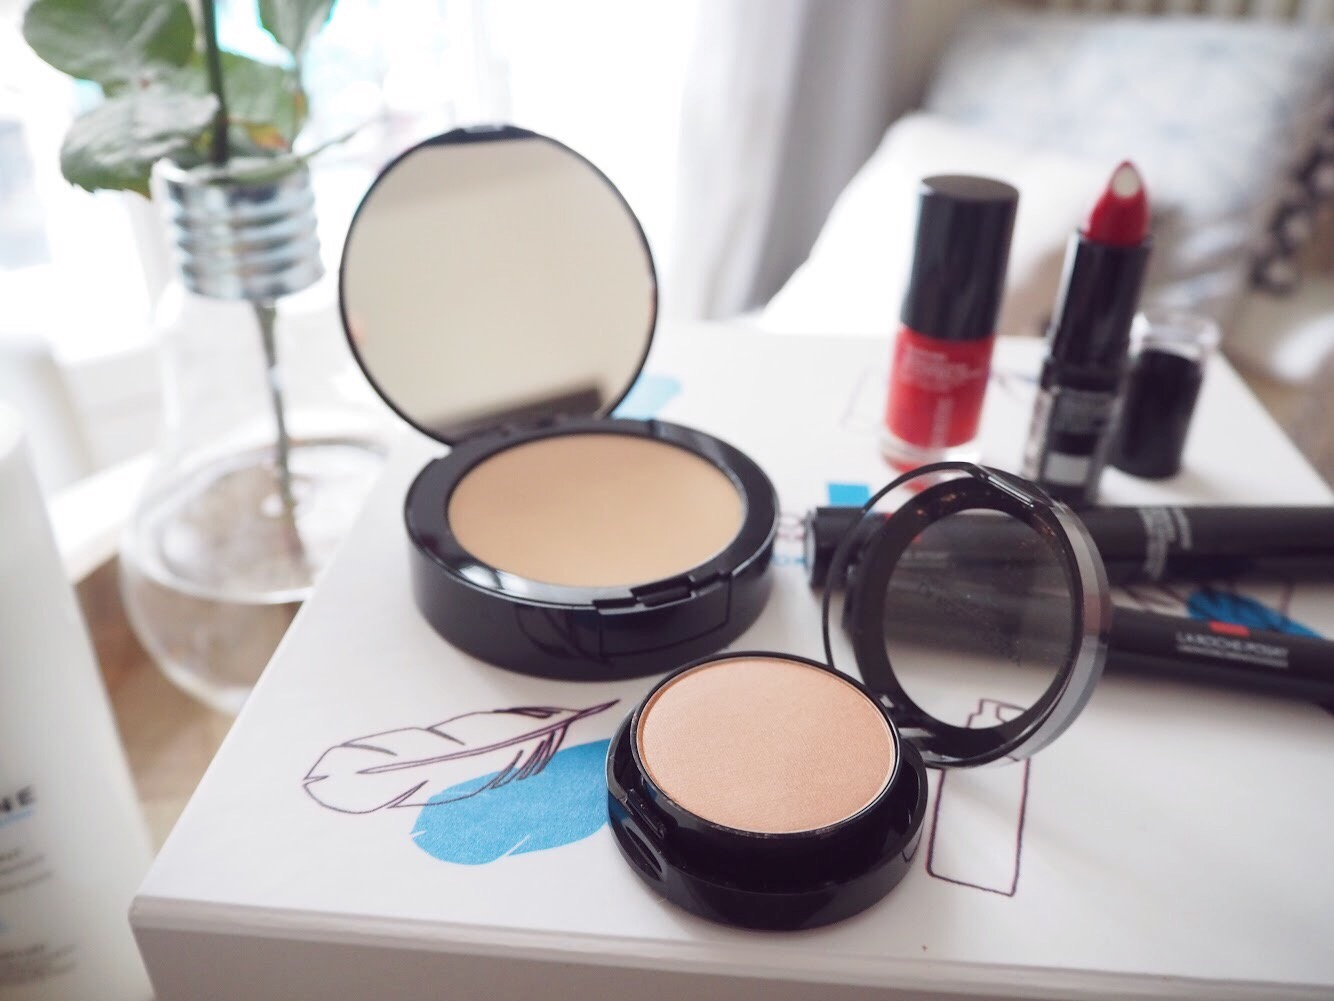 maquillage laroche-posay 5